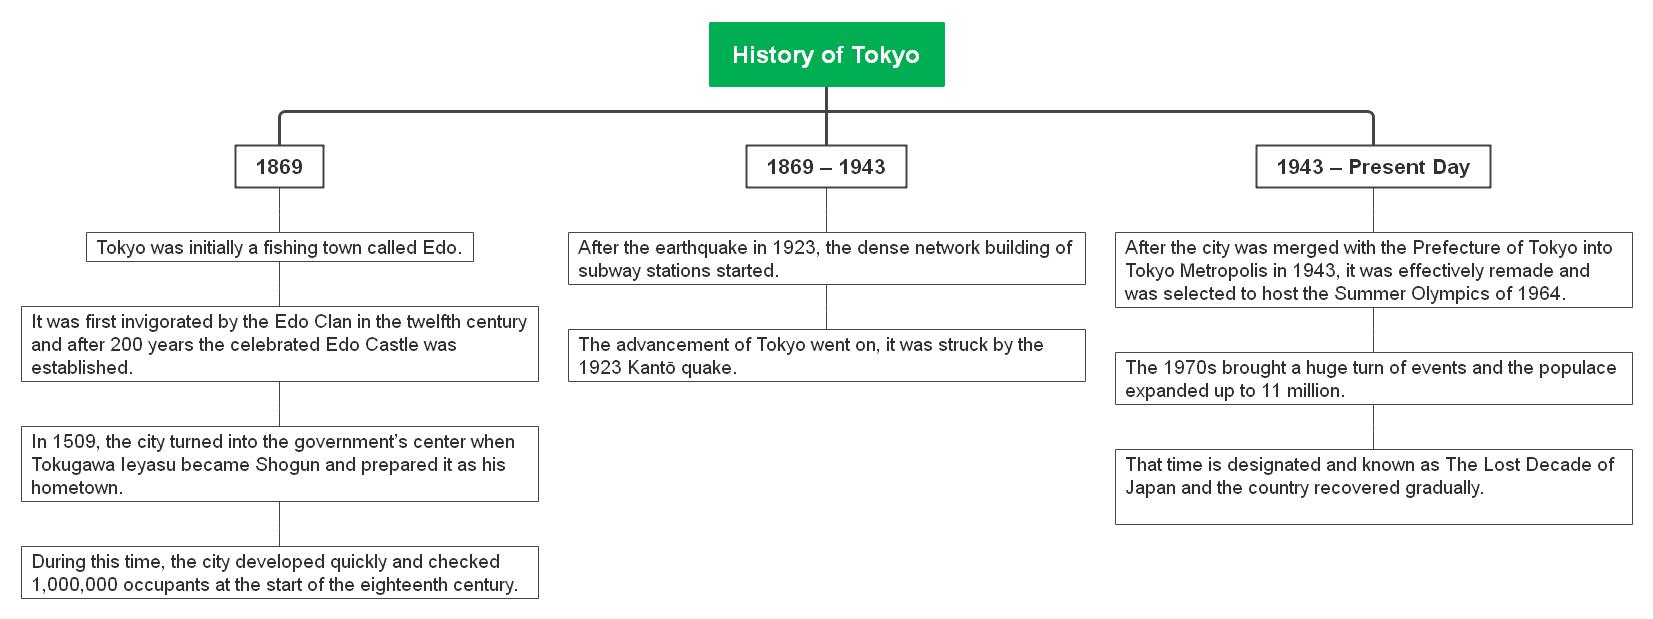 history-of-tokyo